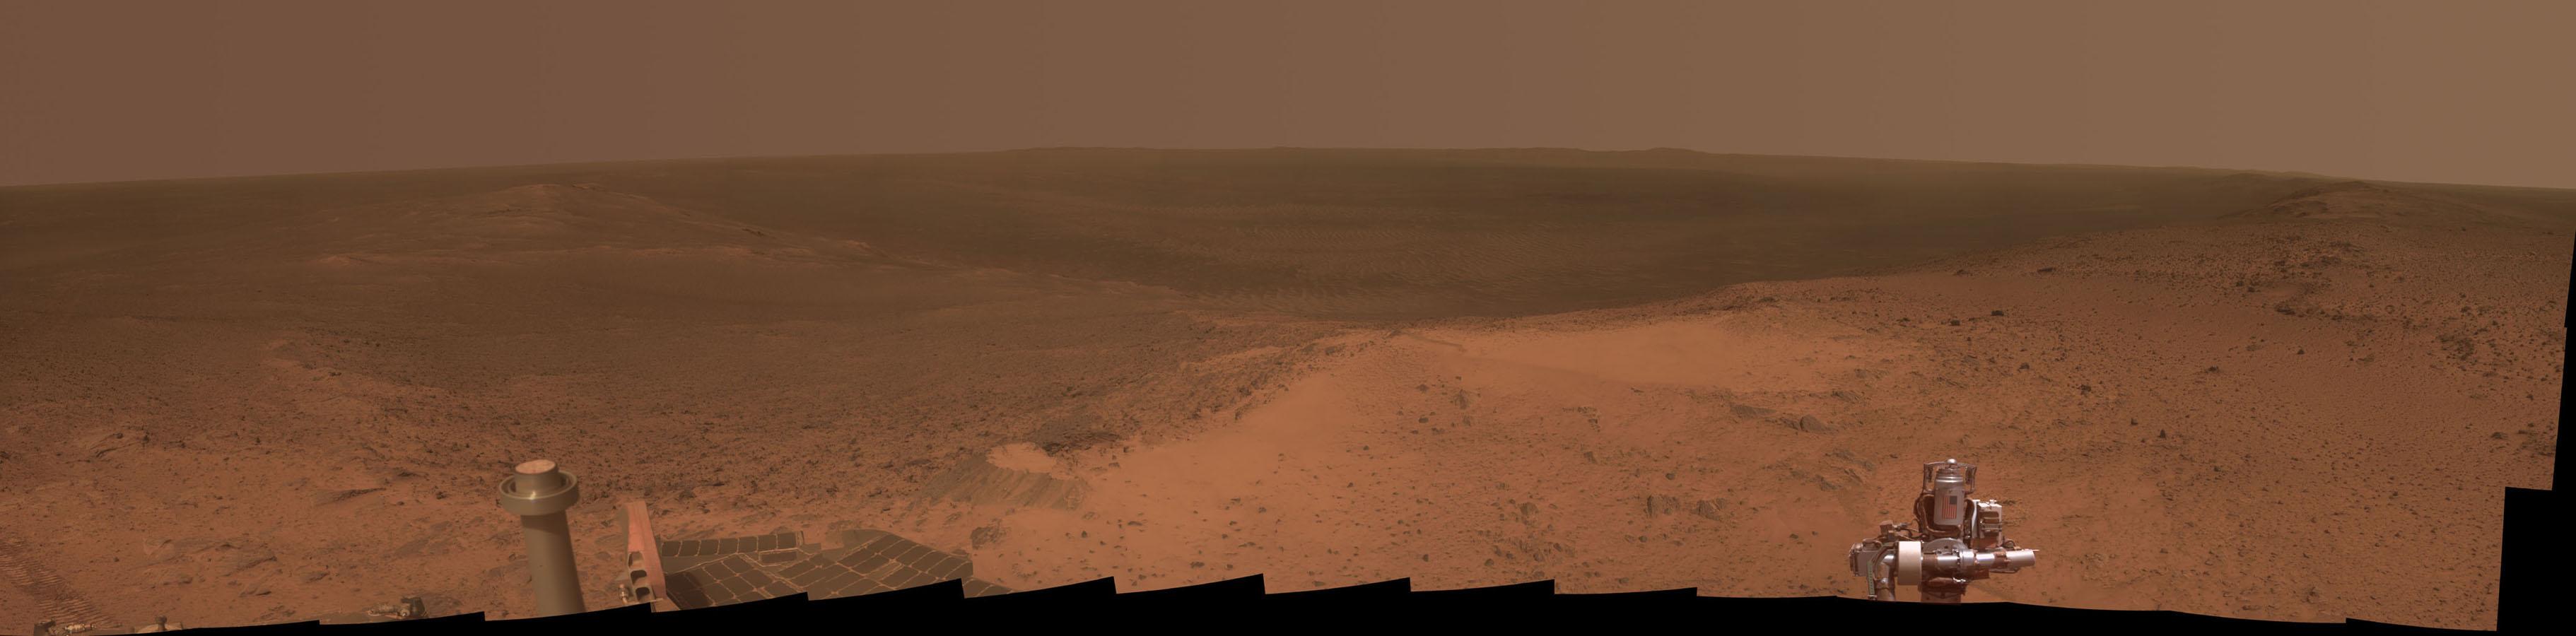 nasa brings mars landing to viewers everywhere - photo #17